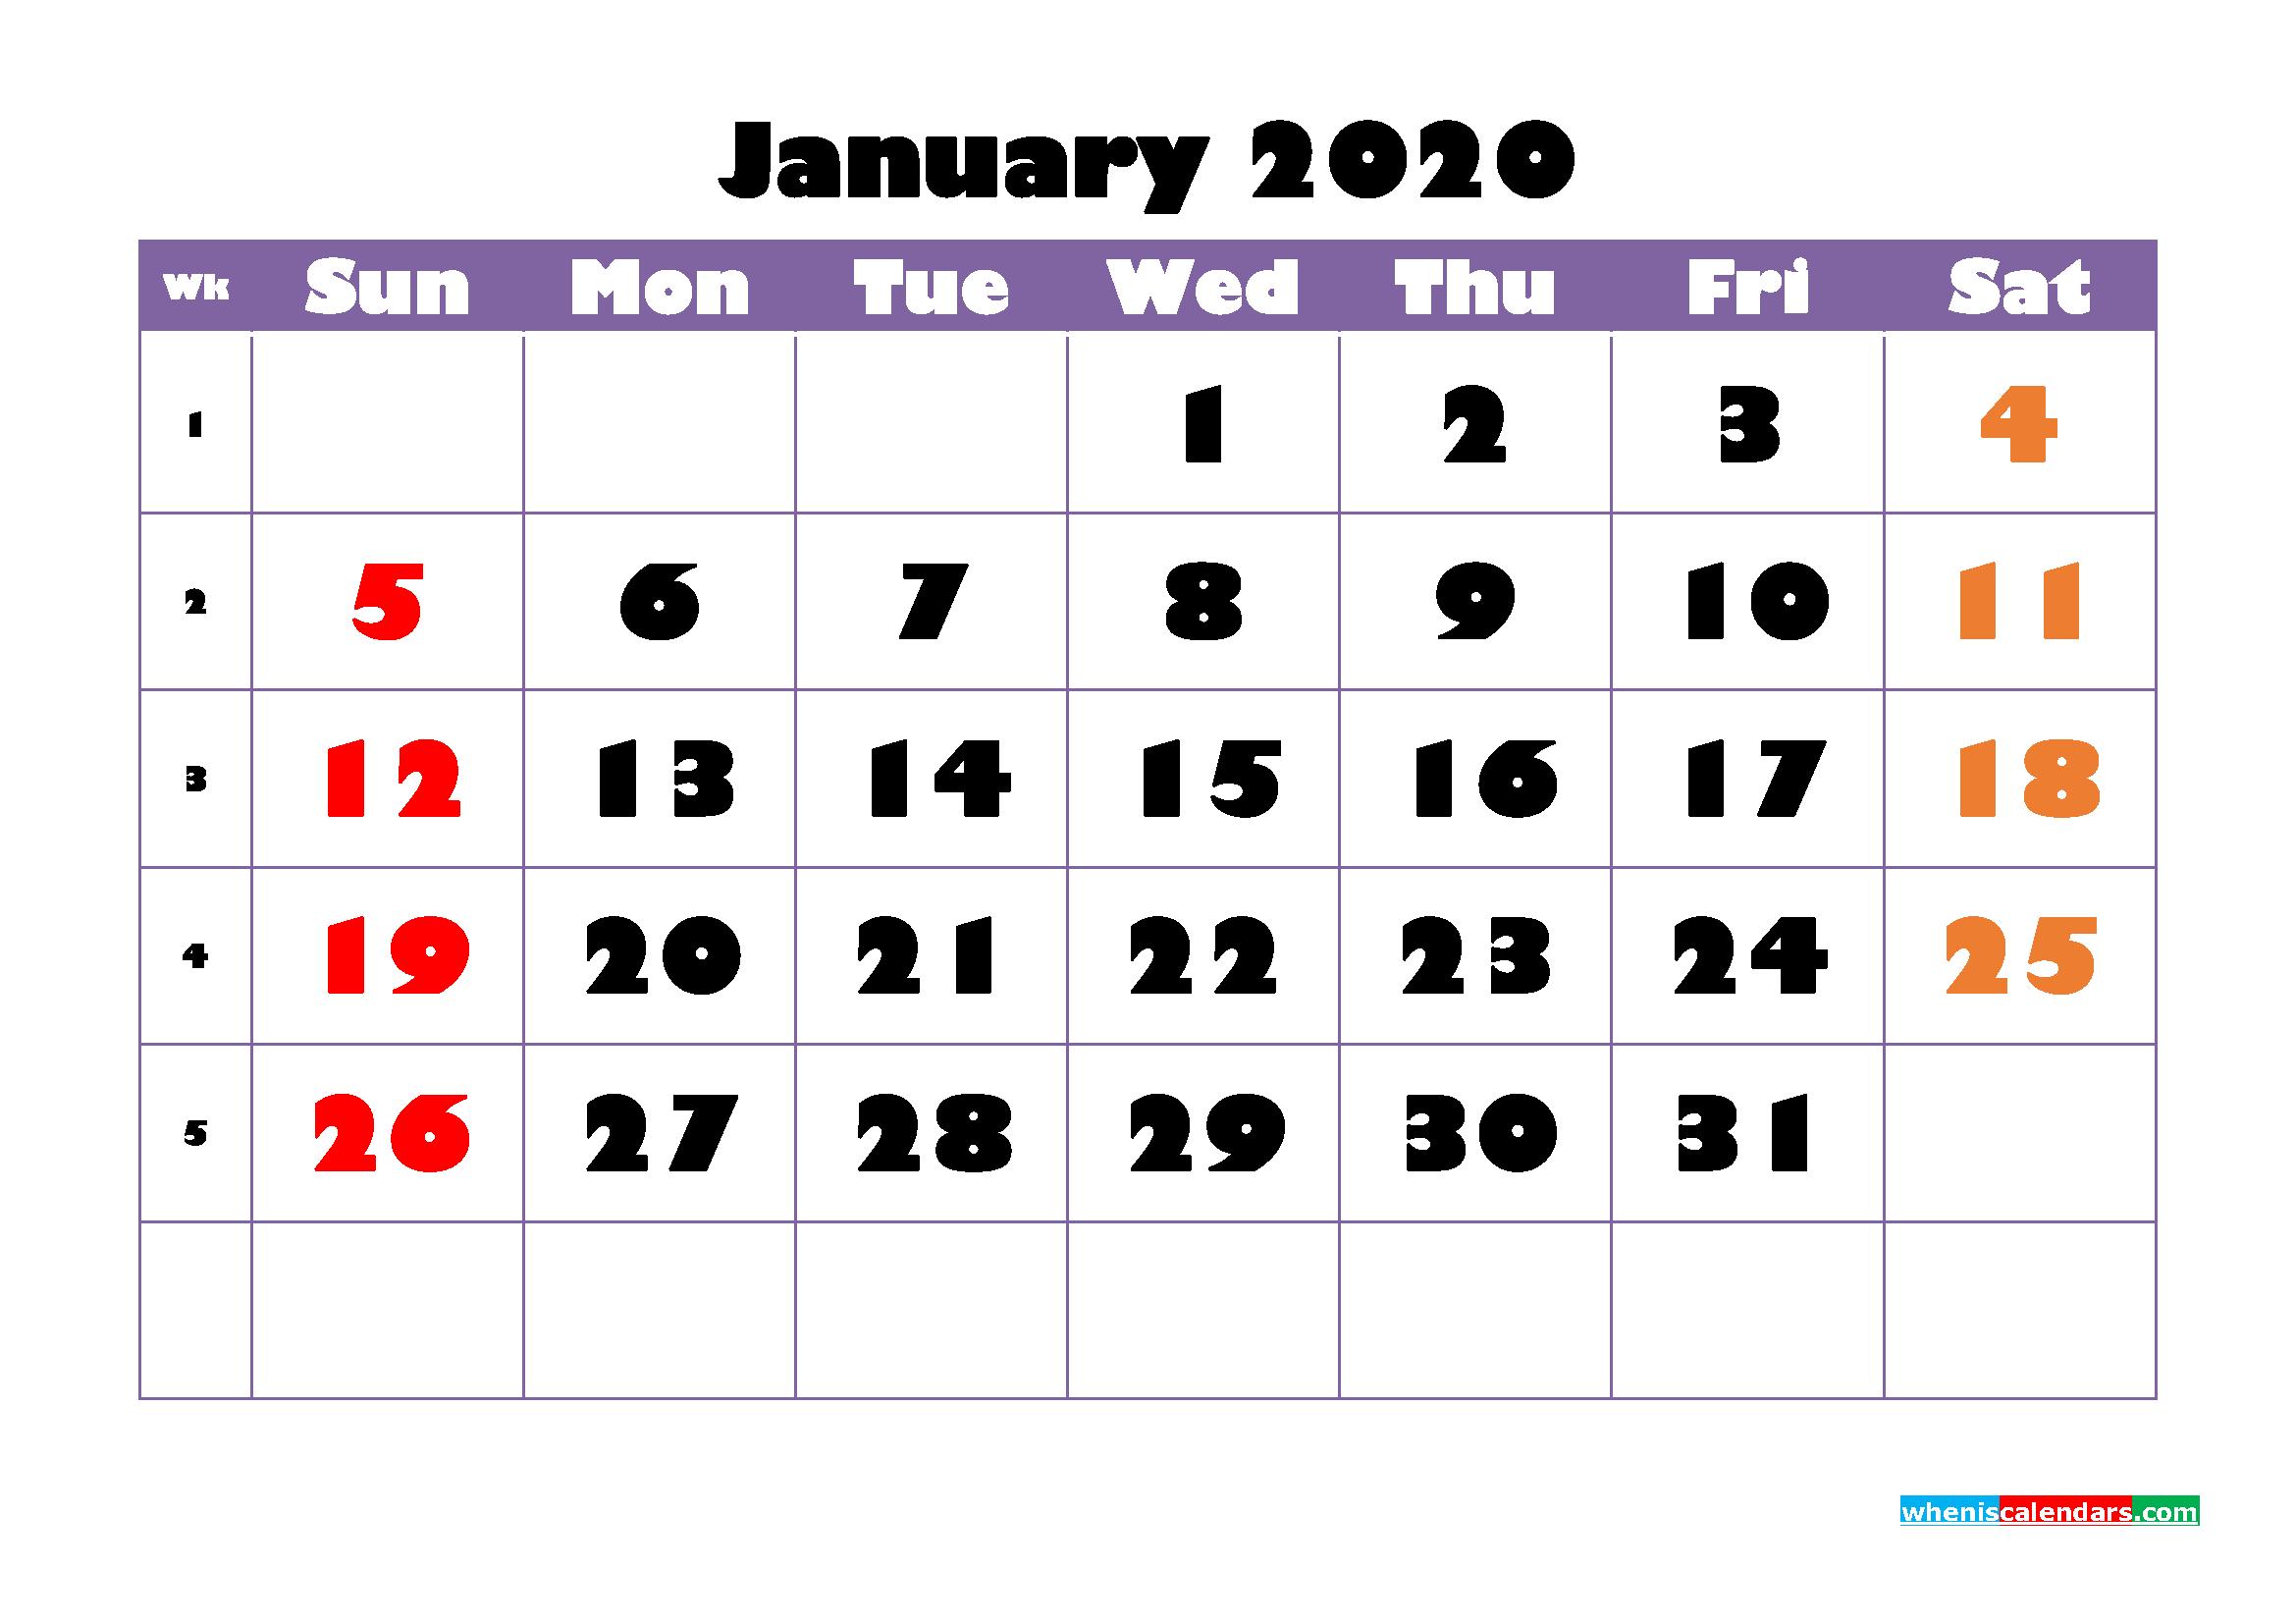 Free Printable January 2020 Calendar - No.m20b745